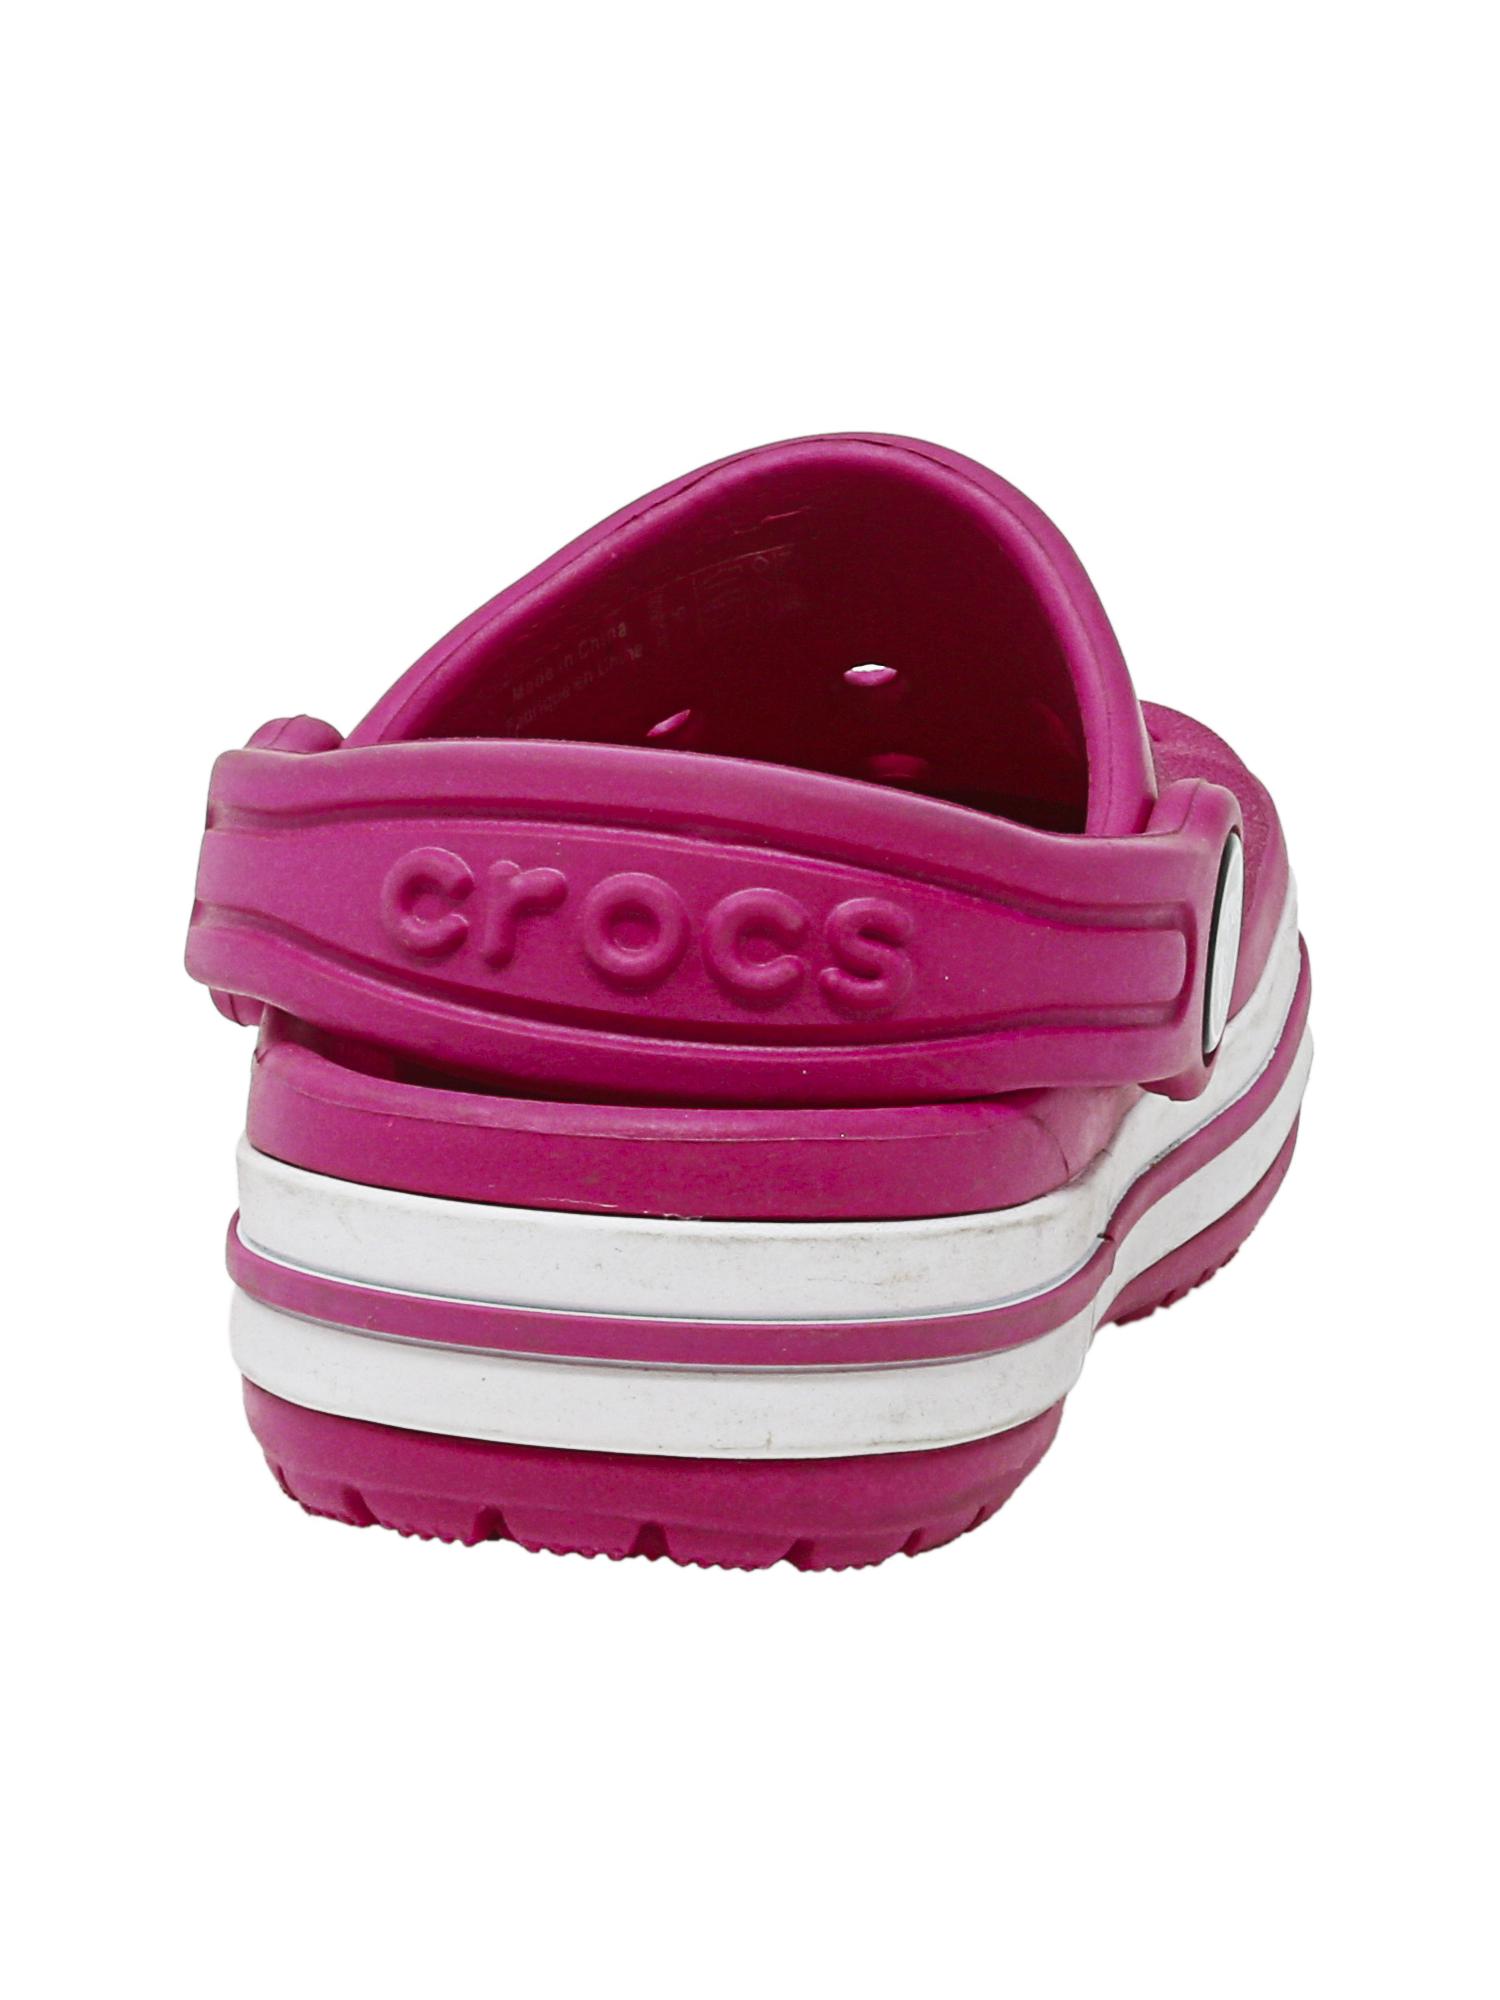 Crocs-Bayaband-Clog-Ankle-High-Clogs thumbnail 6